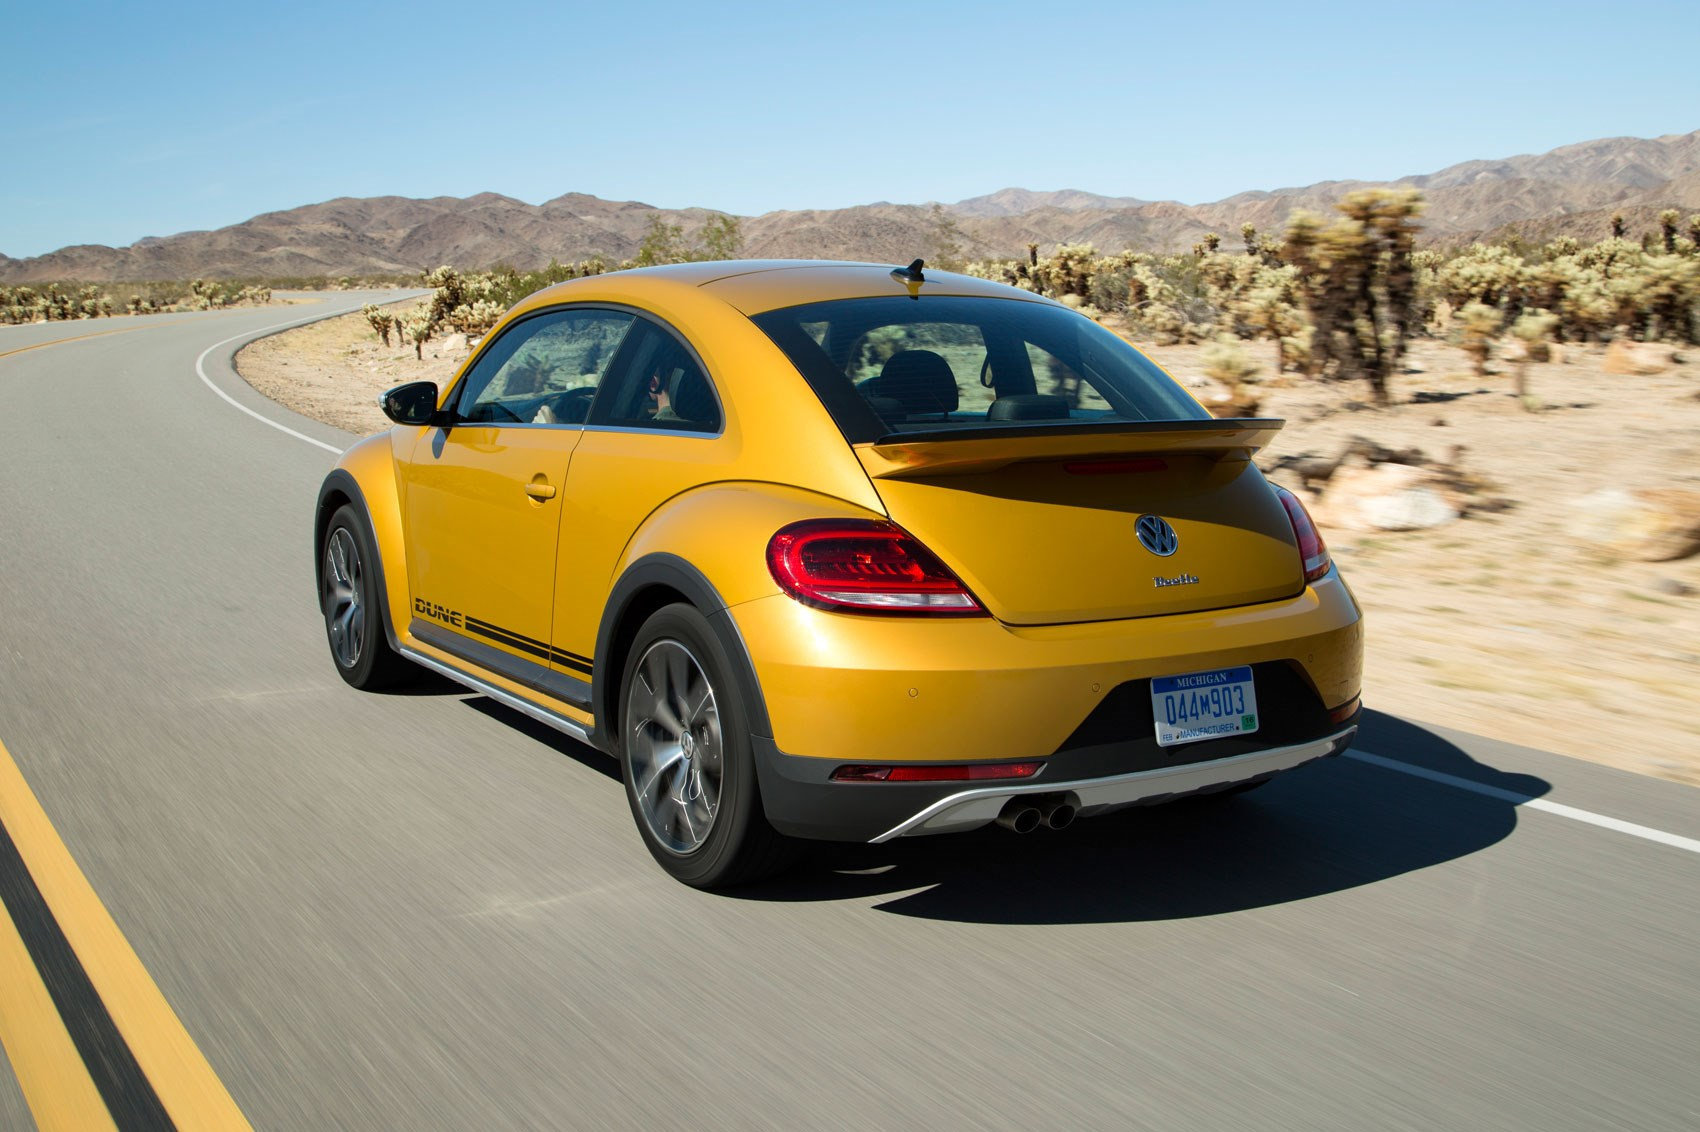 vw beetle dune 2016 revealed bug gets the alltrack treatment by car magazine. Black Bedroom Furniture Sets. Home Design Ideas